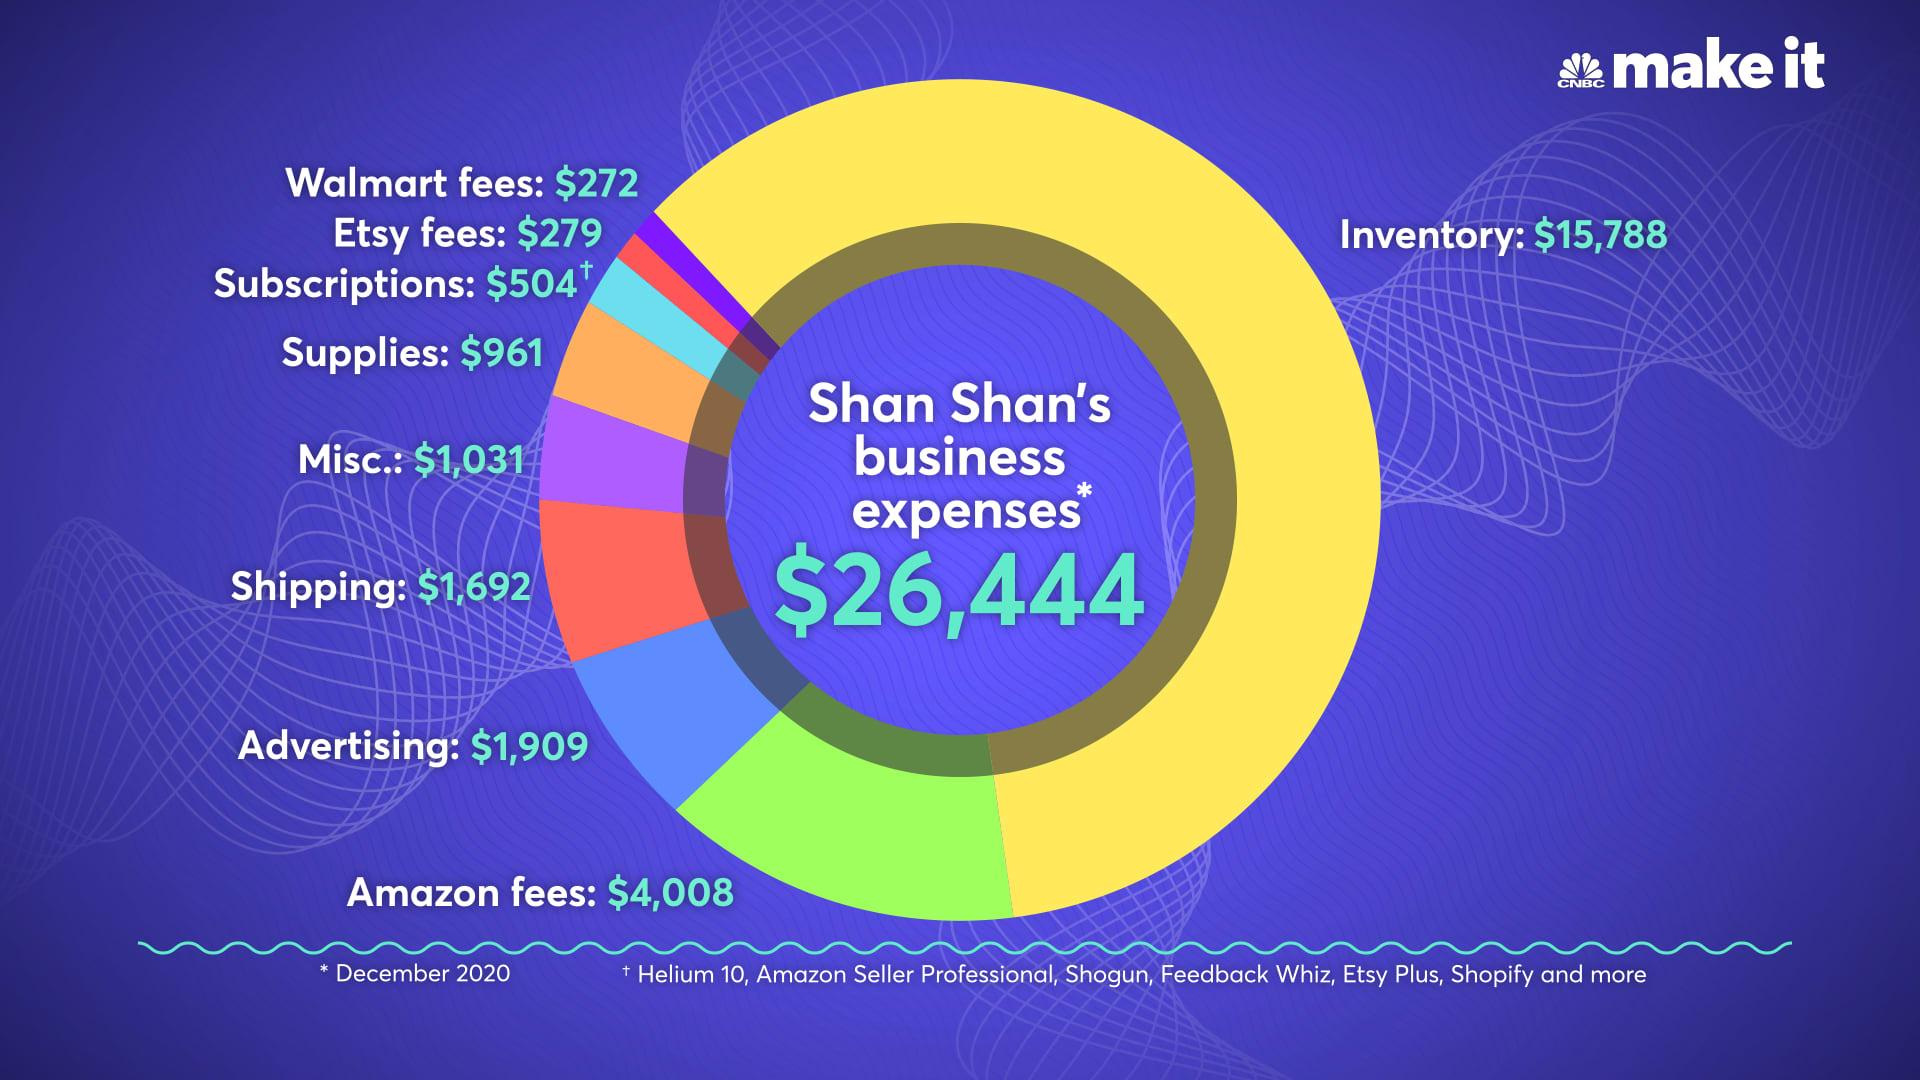 Shan Shan Fu's business expenses for December 2020.